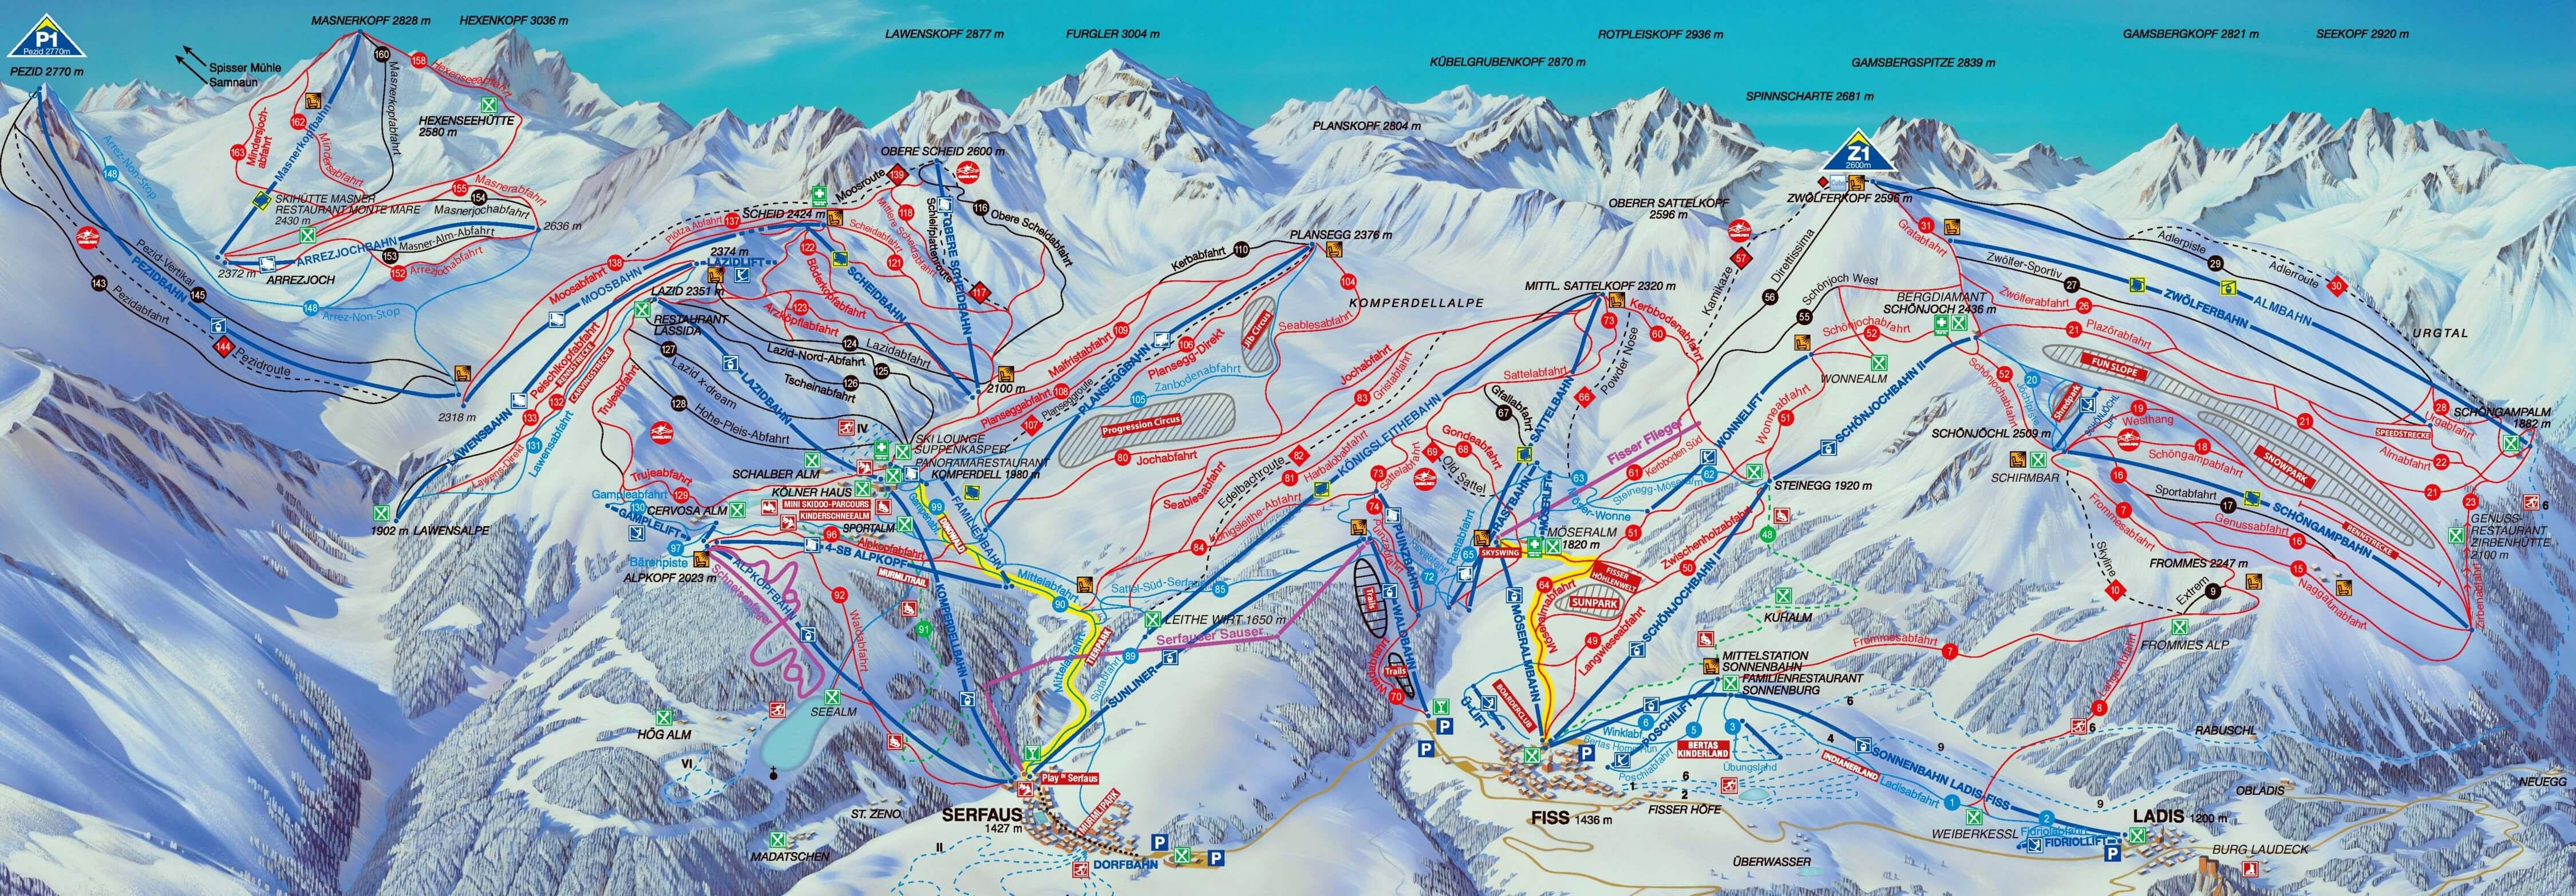 Ski resort Fiss - Slopes - TopSkiResort.com